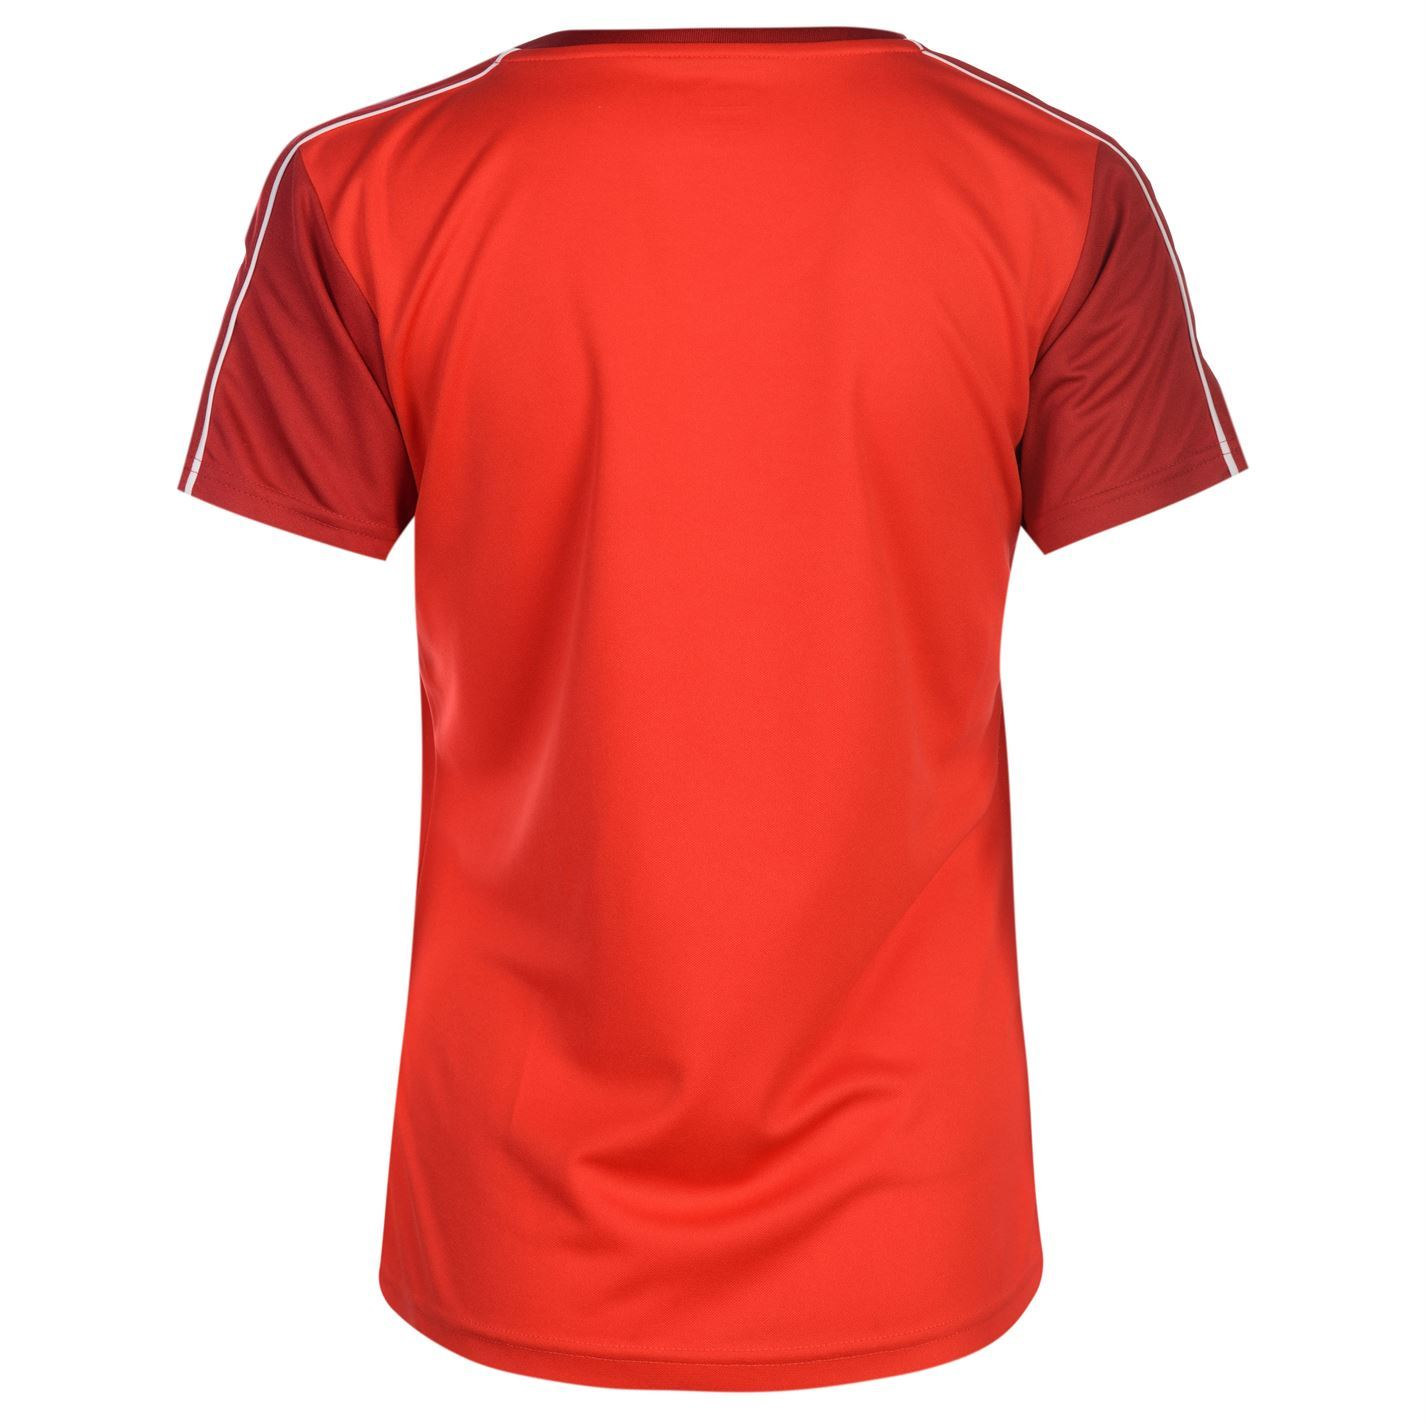 ... Puma Glasgow Rangers Away Jersey 2017-18 Womens Red White Football  Soccer Shirt ... abde1f0a5